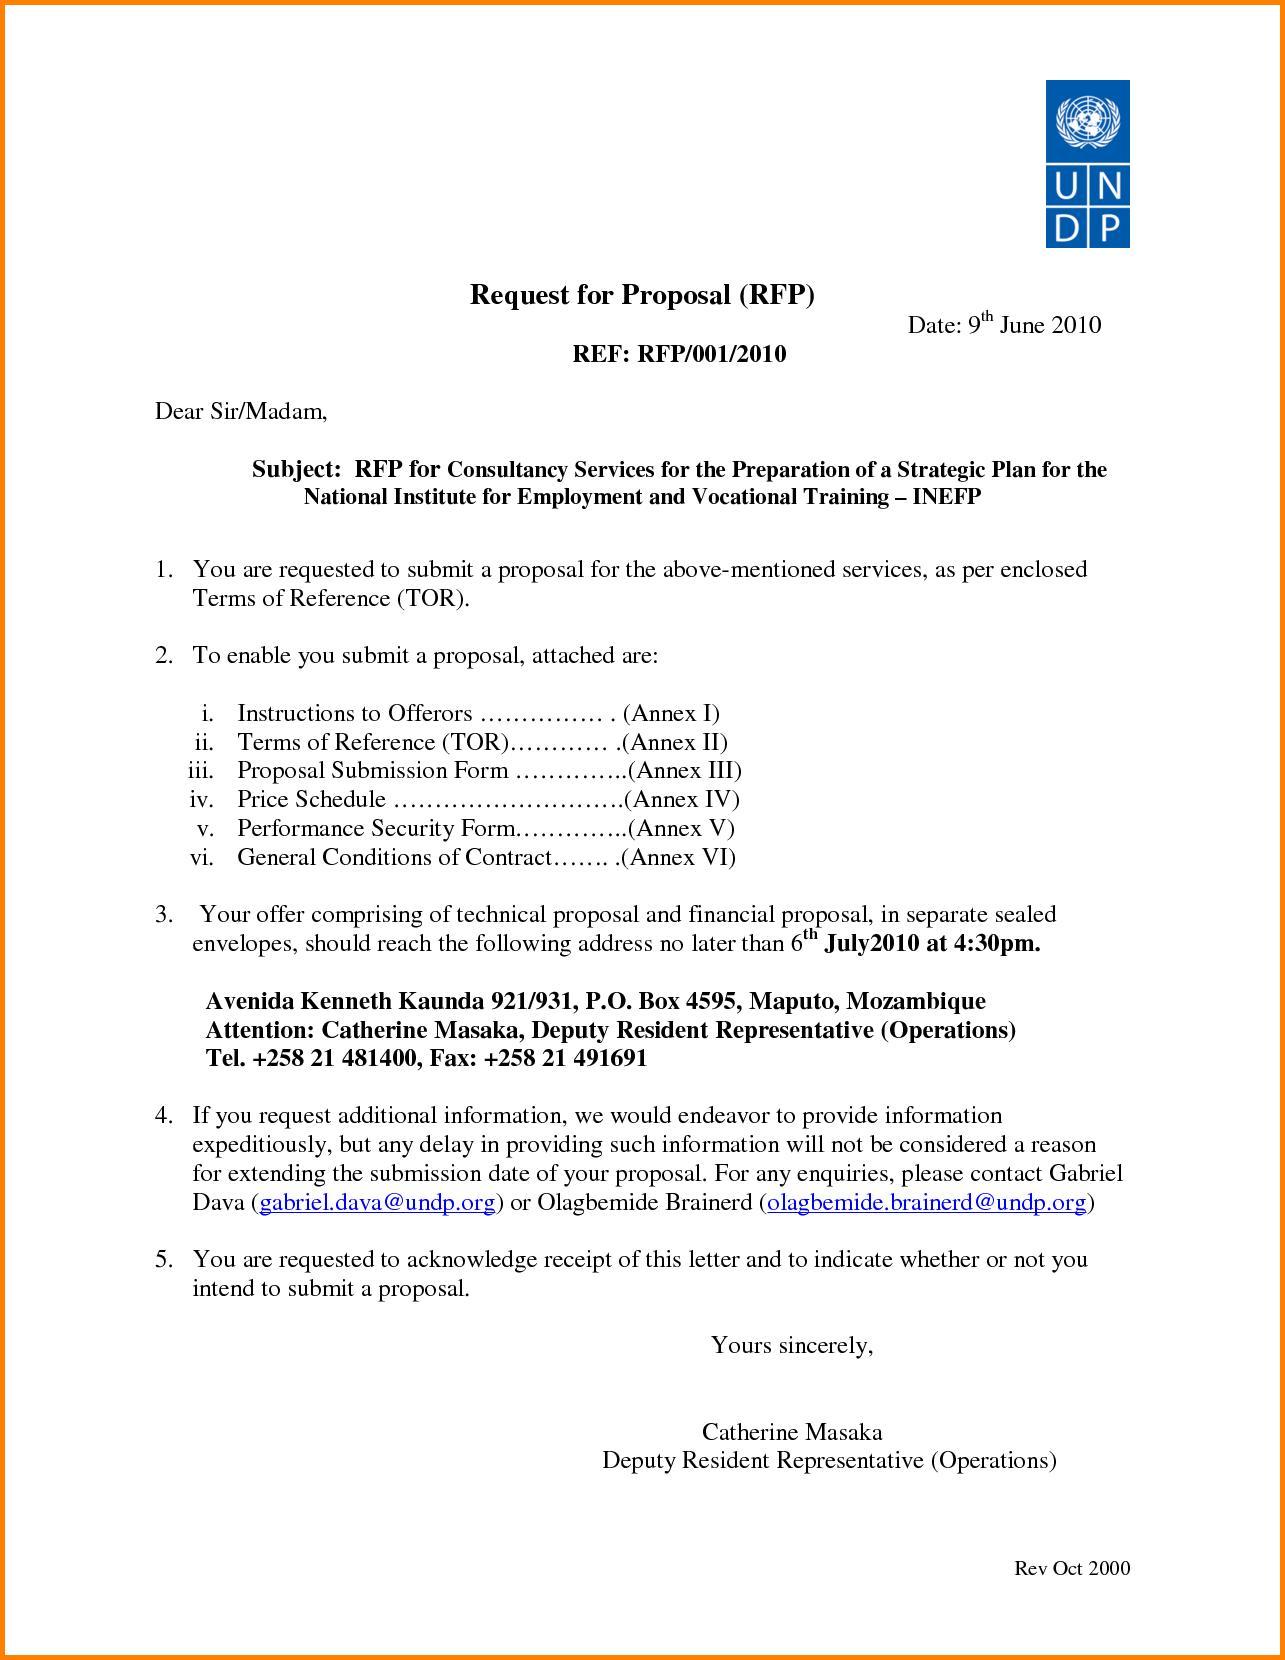 Financial Proposal Template Undp